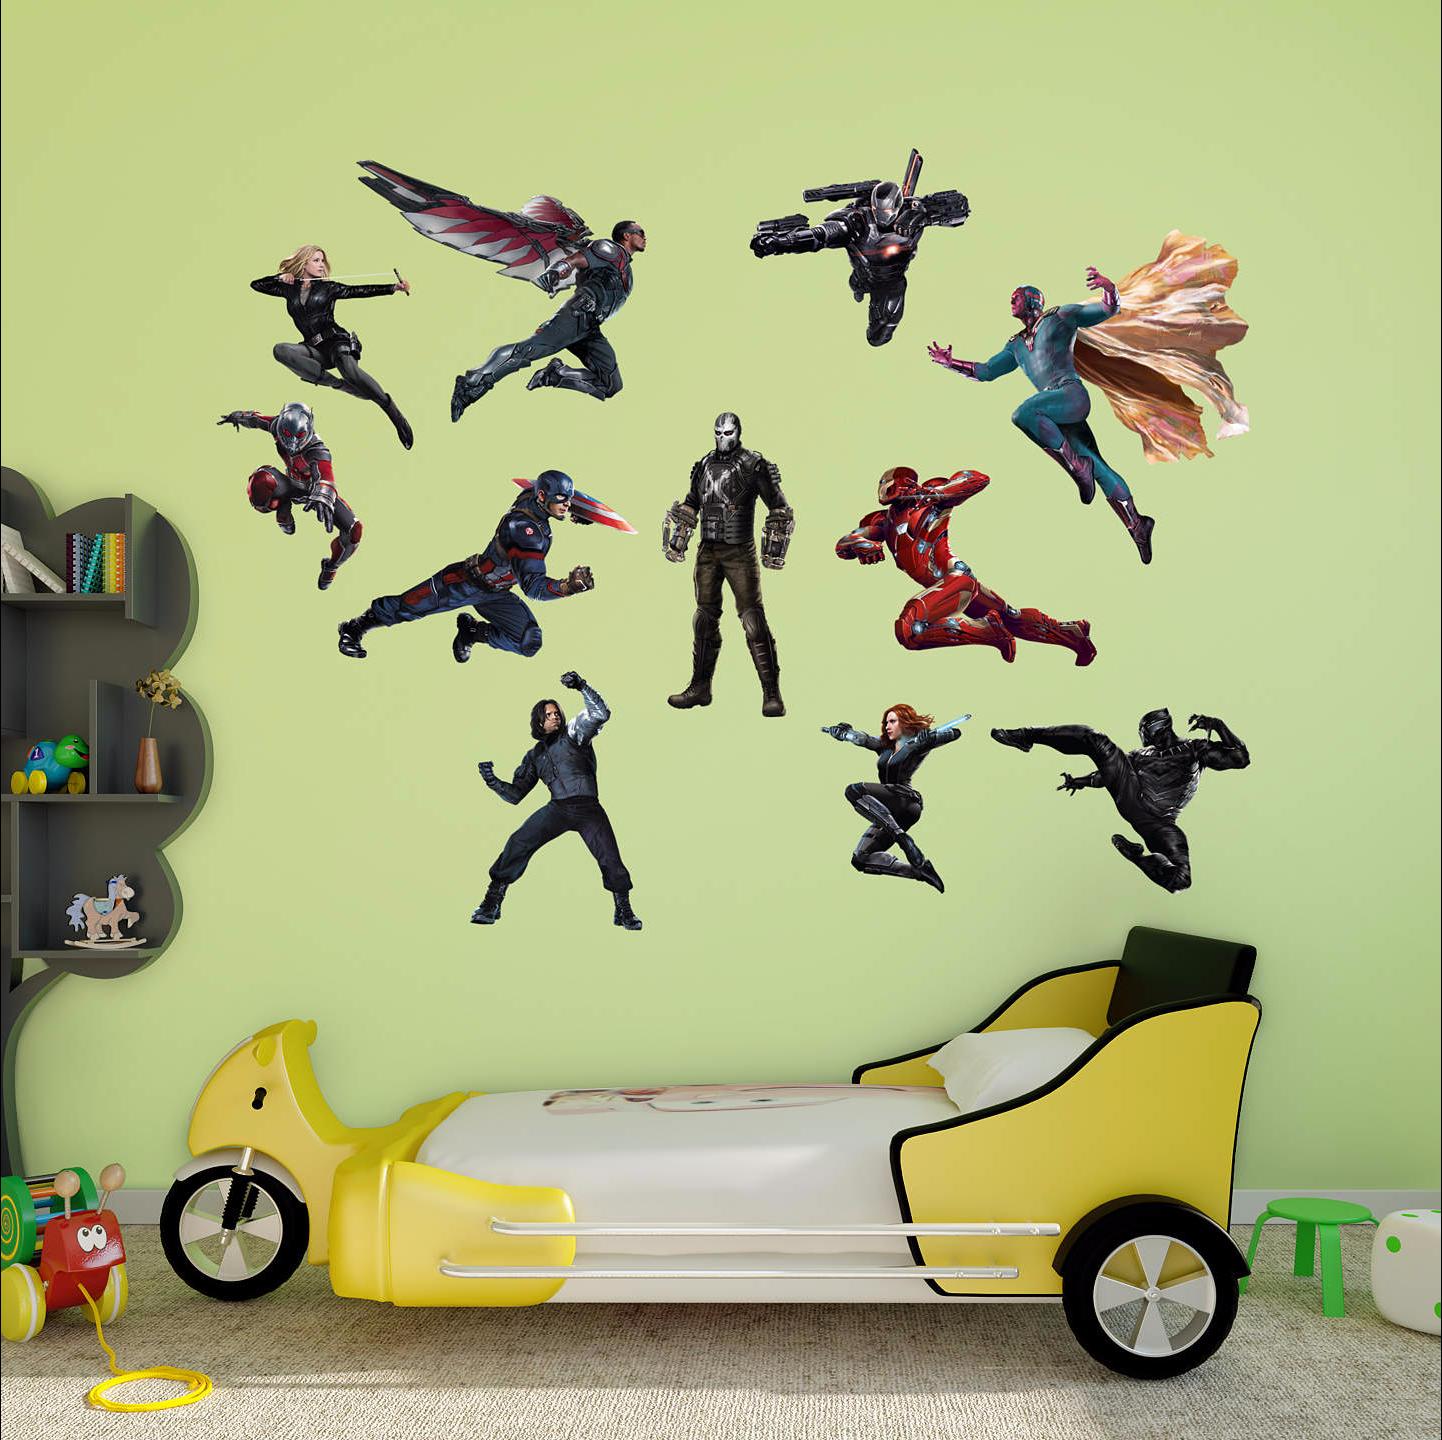 Image - Civil War Fathead 02.png | Marvel Cinematic Universe Wiki ...